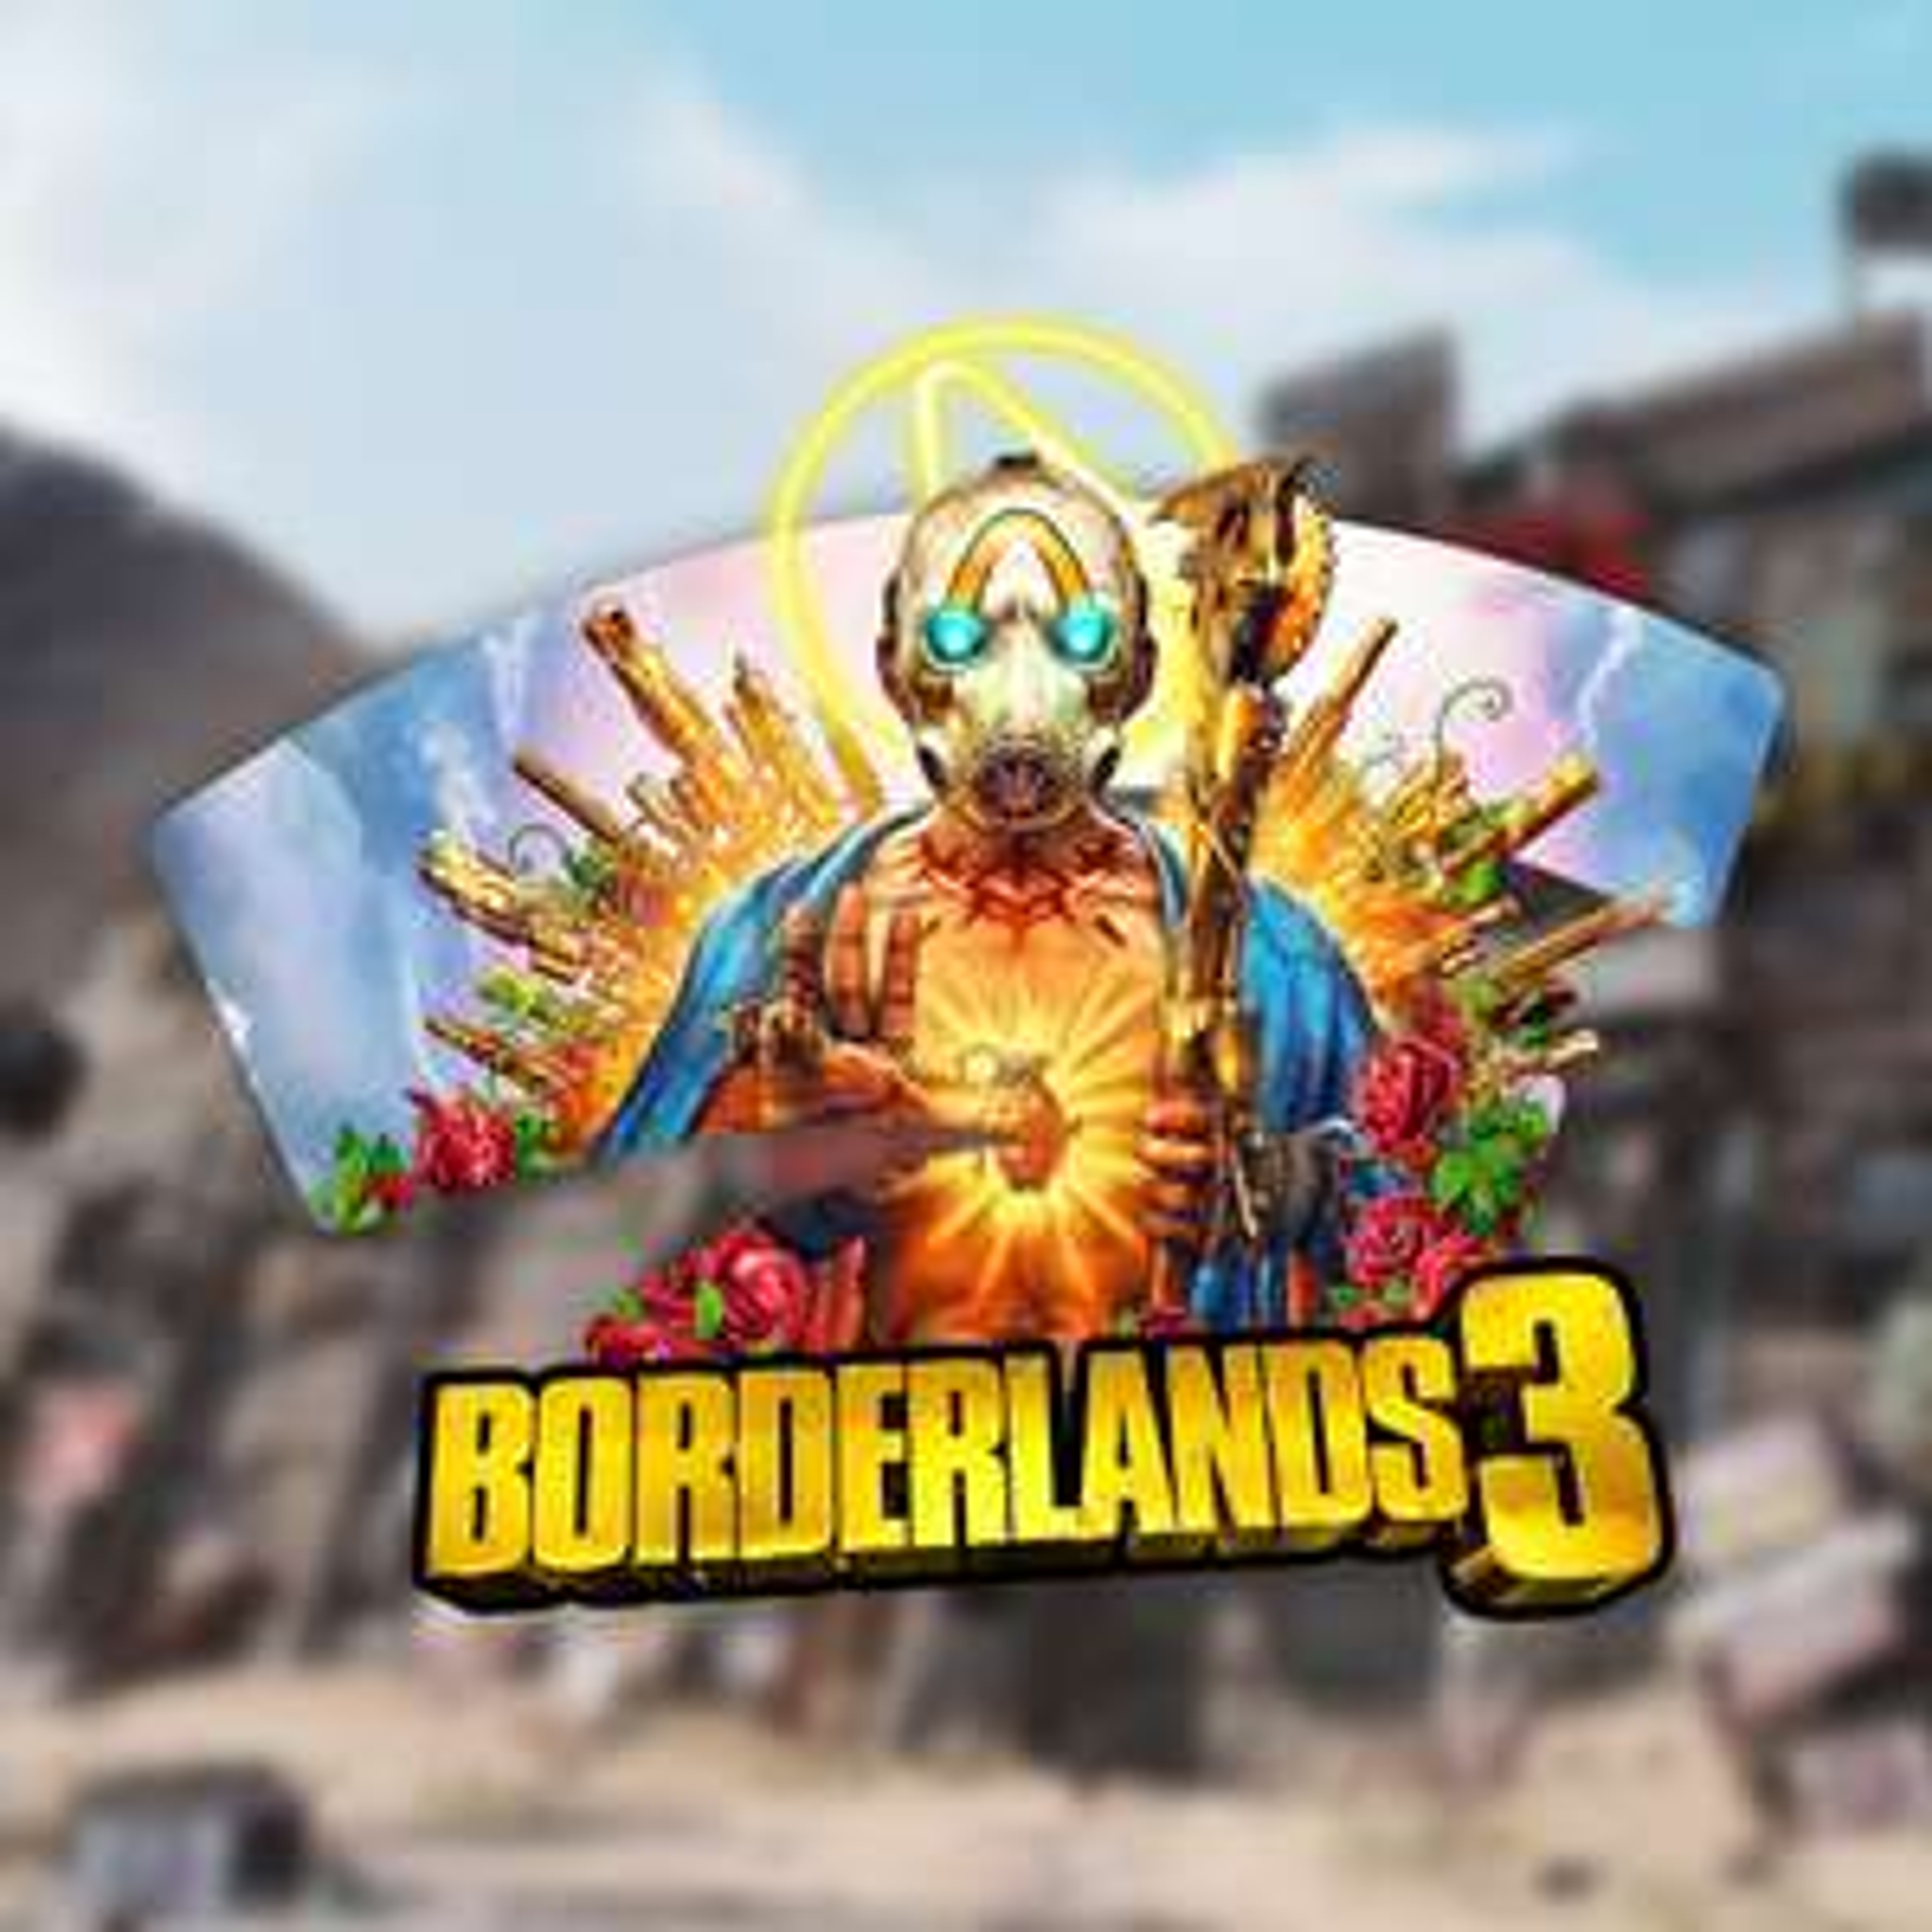 Borderlands 3 free Weekend kostenlos [Stadia Pro]